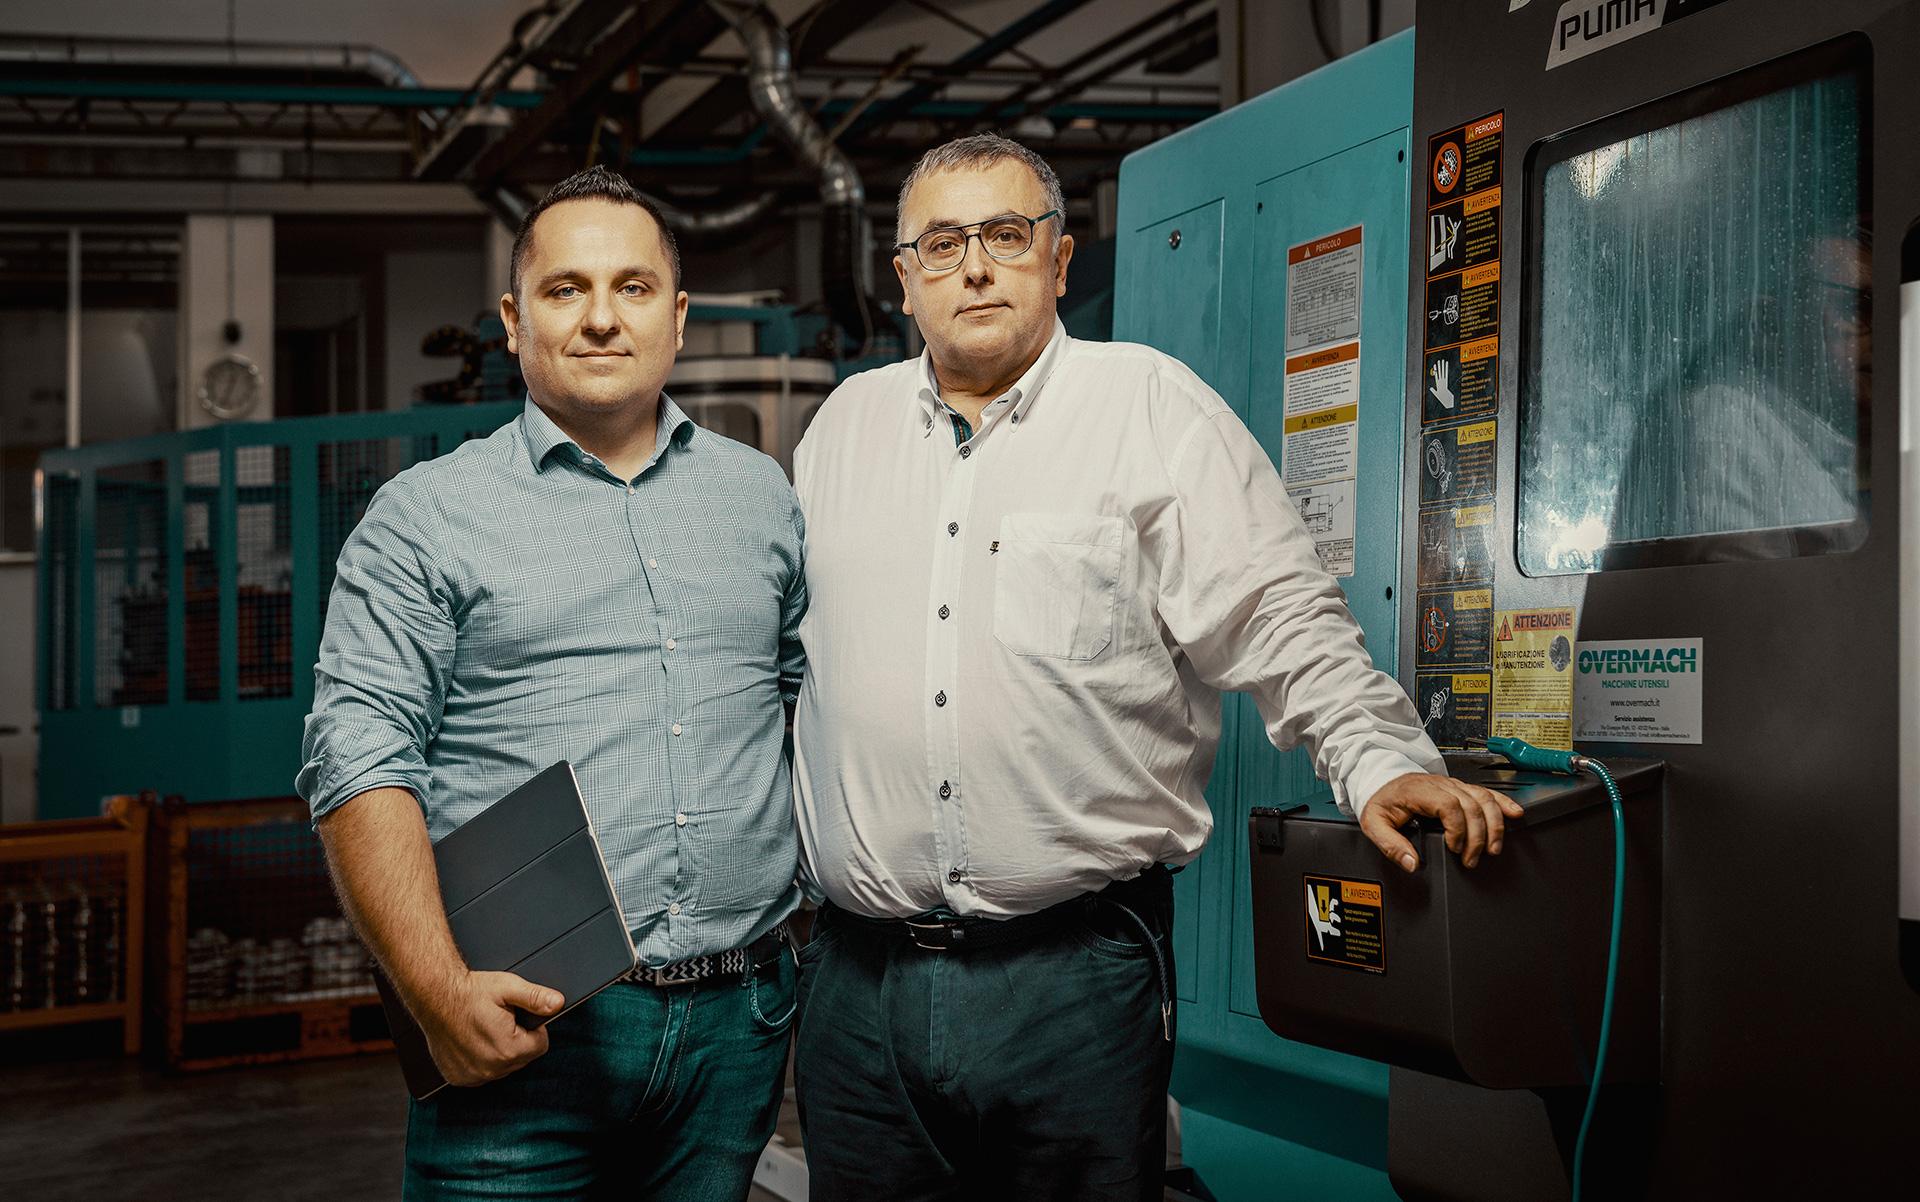 Benevelli S.r.l公司的商务 总监Alessandro Benevelli (左)和首席执行官Alberto Benevelli。